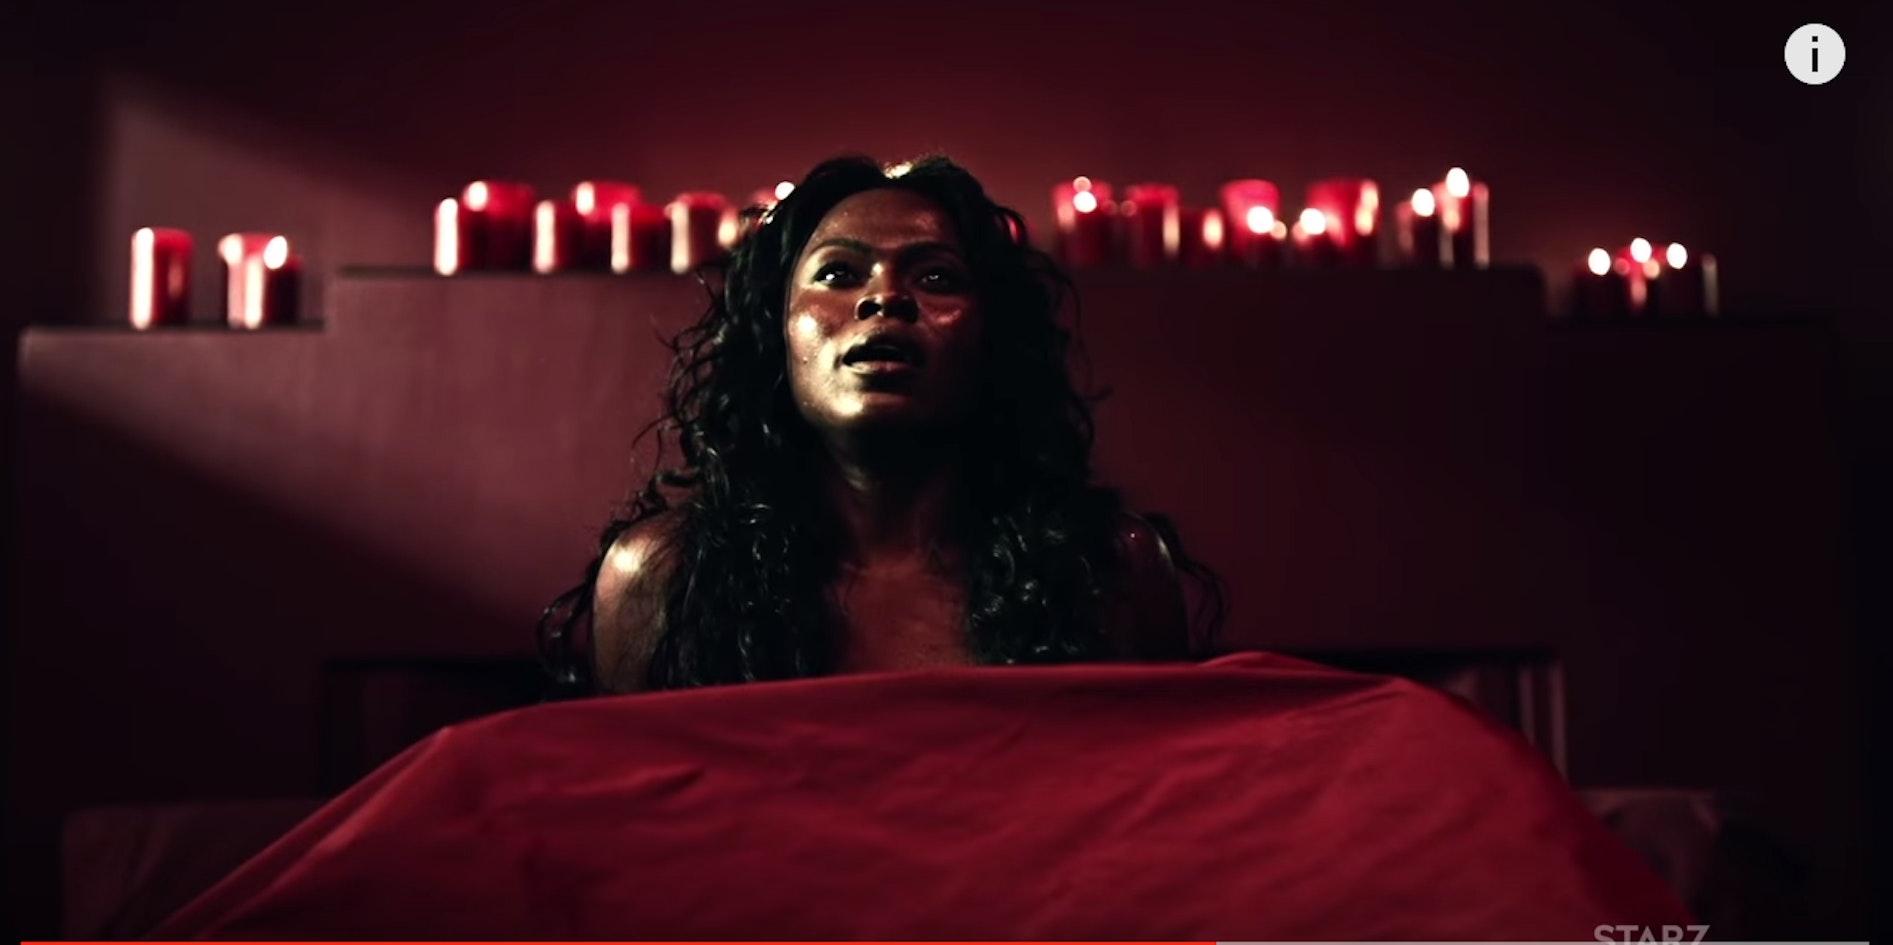 Yetide Badaki as Bilquis in a certain infamous scene